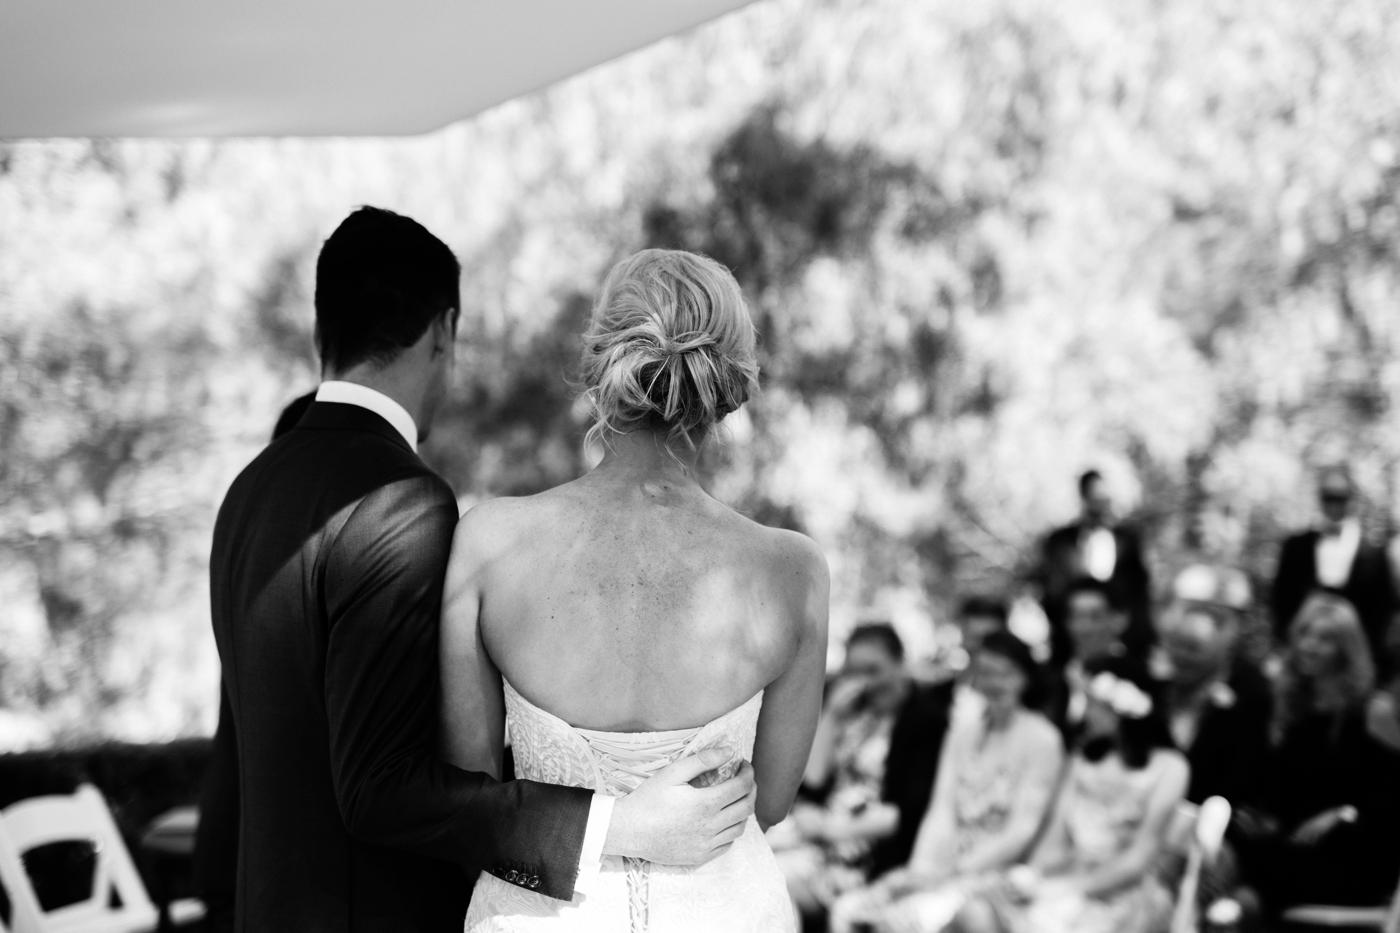 Lauren & Max - Marybank Estate Wedding - Natural wedding photographer in Adelaide - www.katherineschultzphotography.com 59